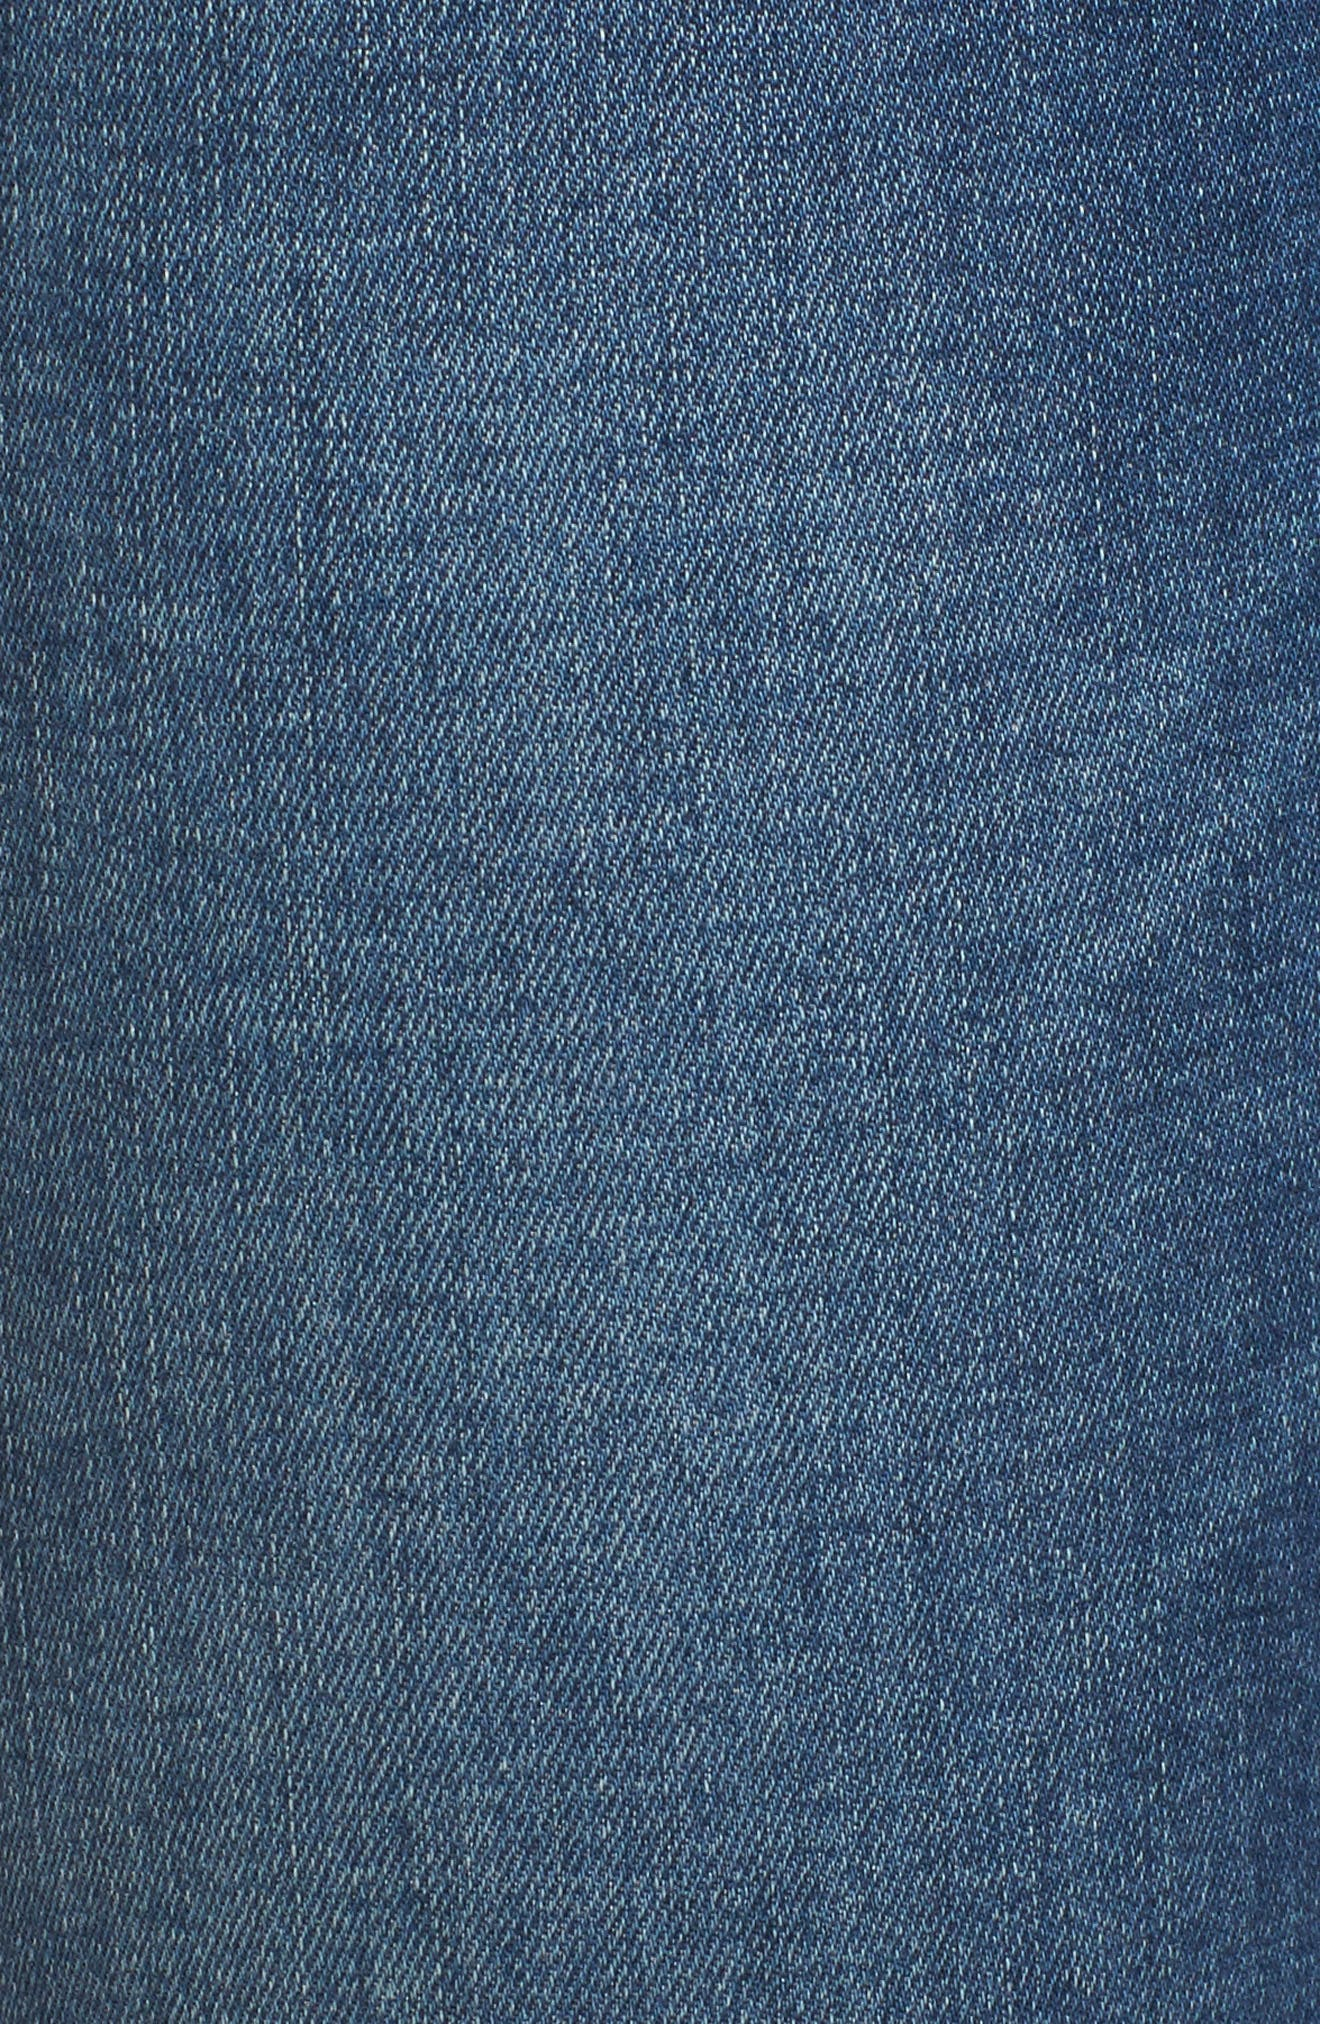 Alternate Image 5  - BLANKNYC Great Escape Skinny Jeans